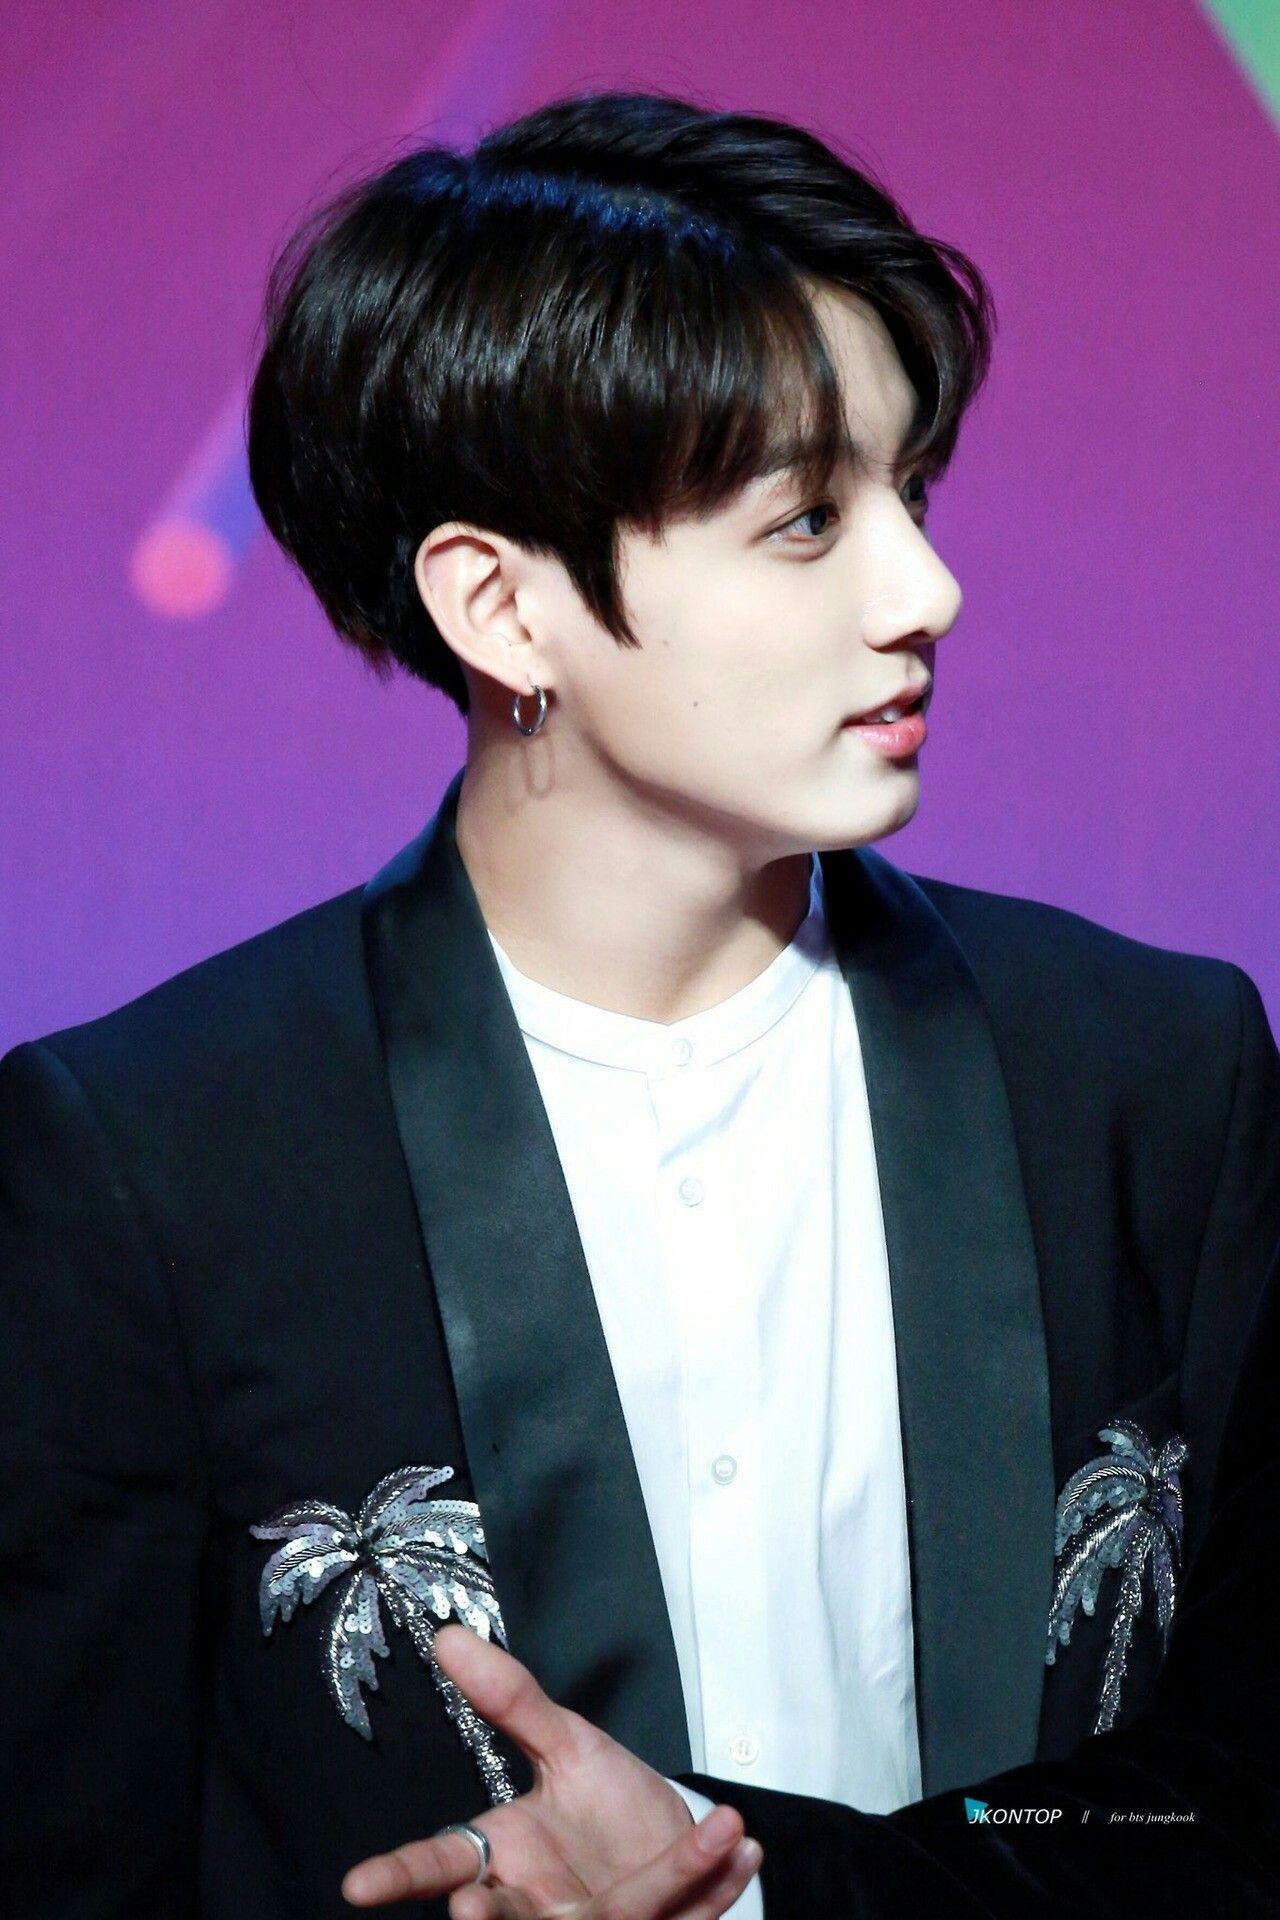 Pin by 옺렘 on bts pinterest bts bts jungkook and korean boy bands